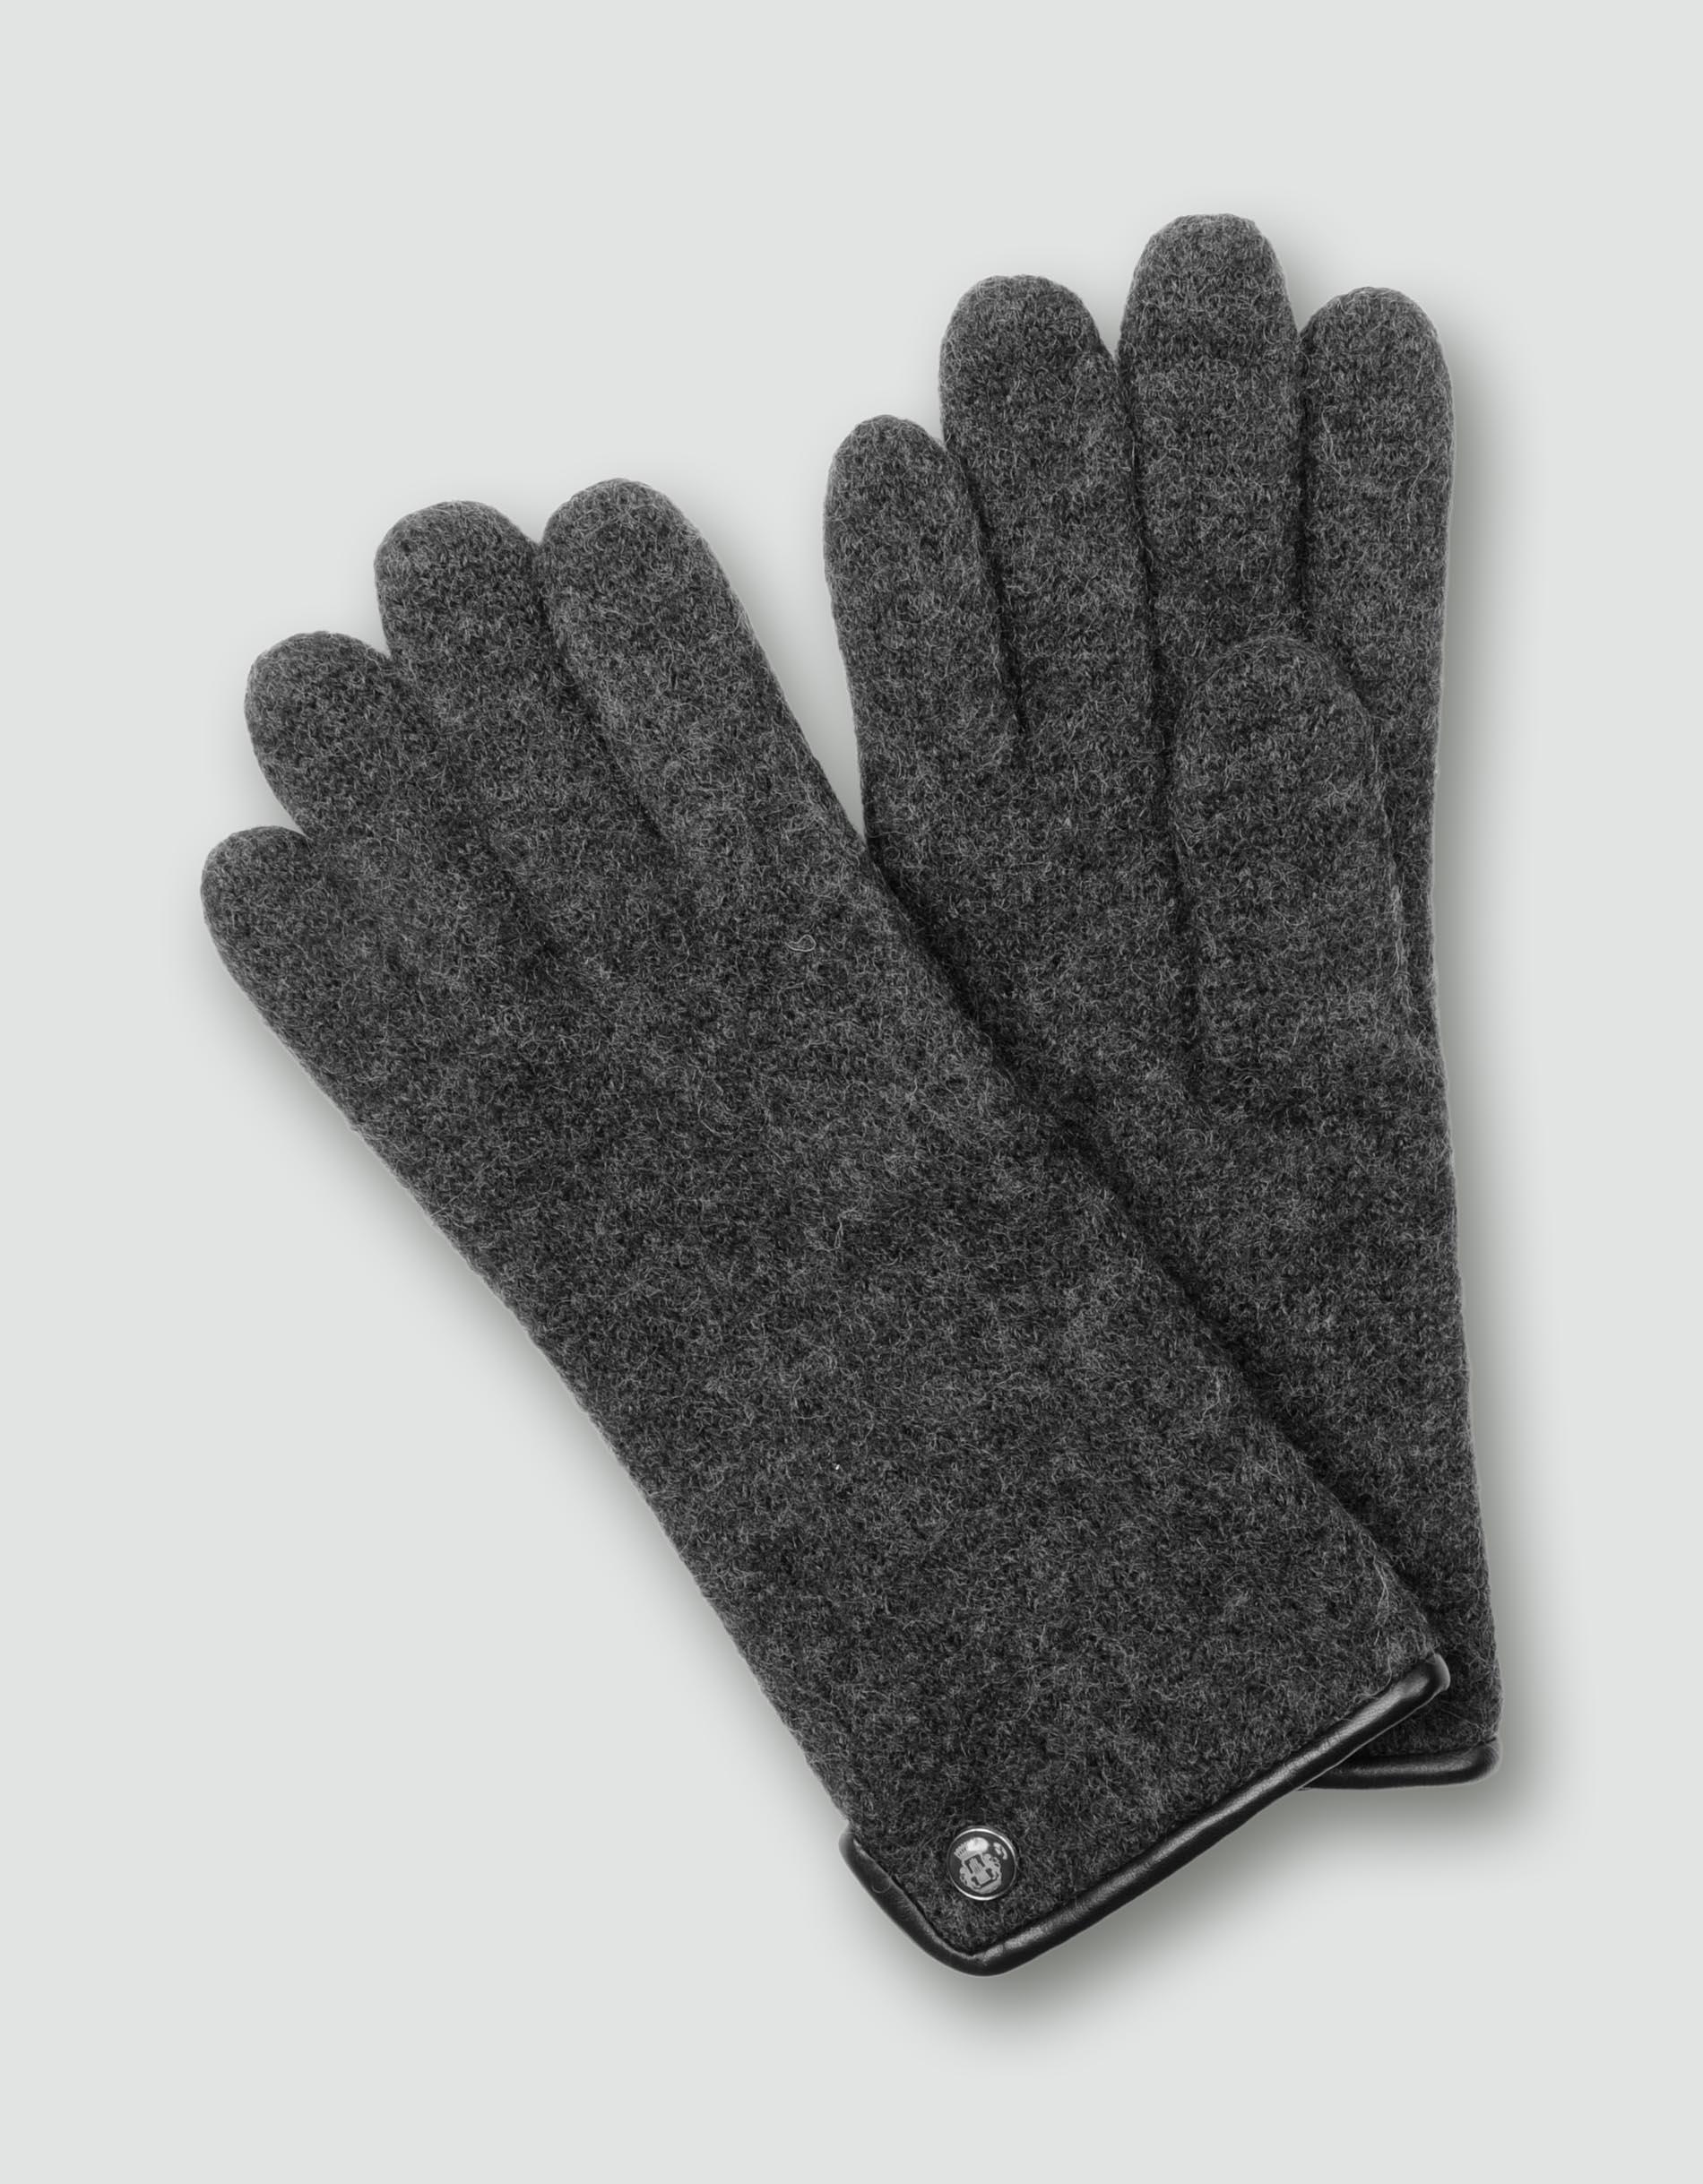 roeckl damen handschuhe walkhandschuh anthrazit empfohlen. Black Bedroom Furniture Sets. Home Design Ideas